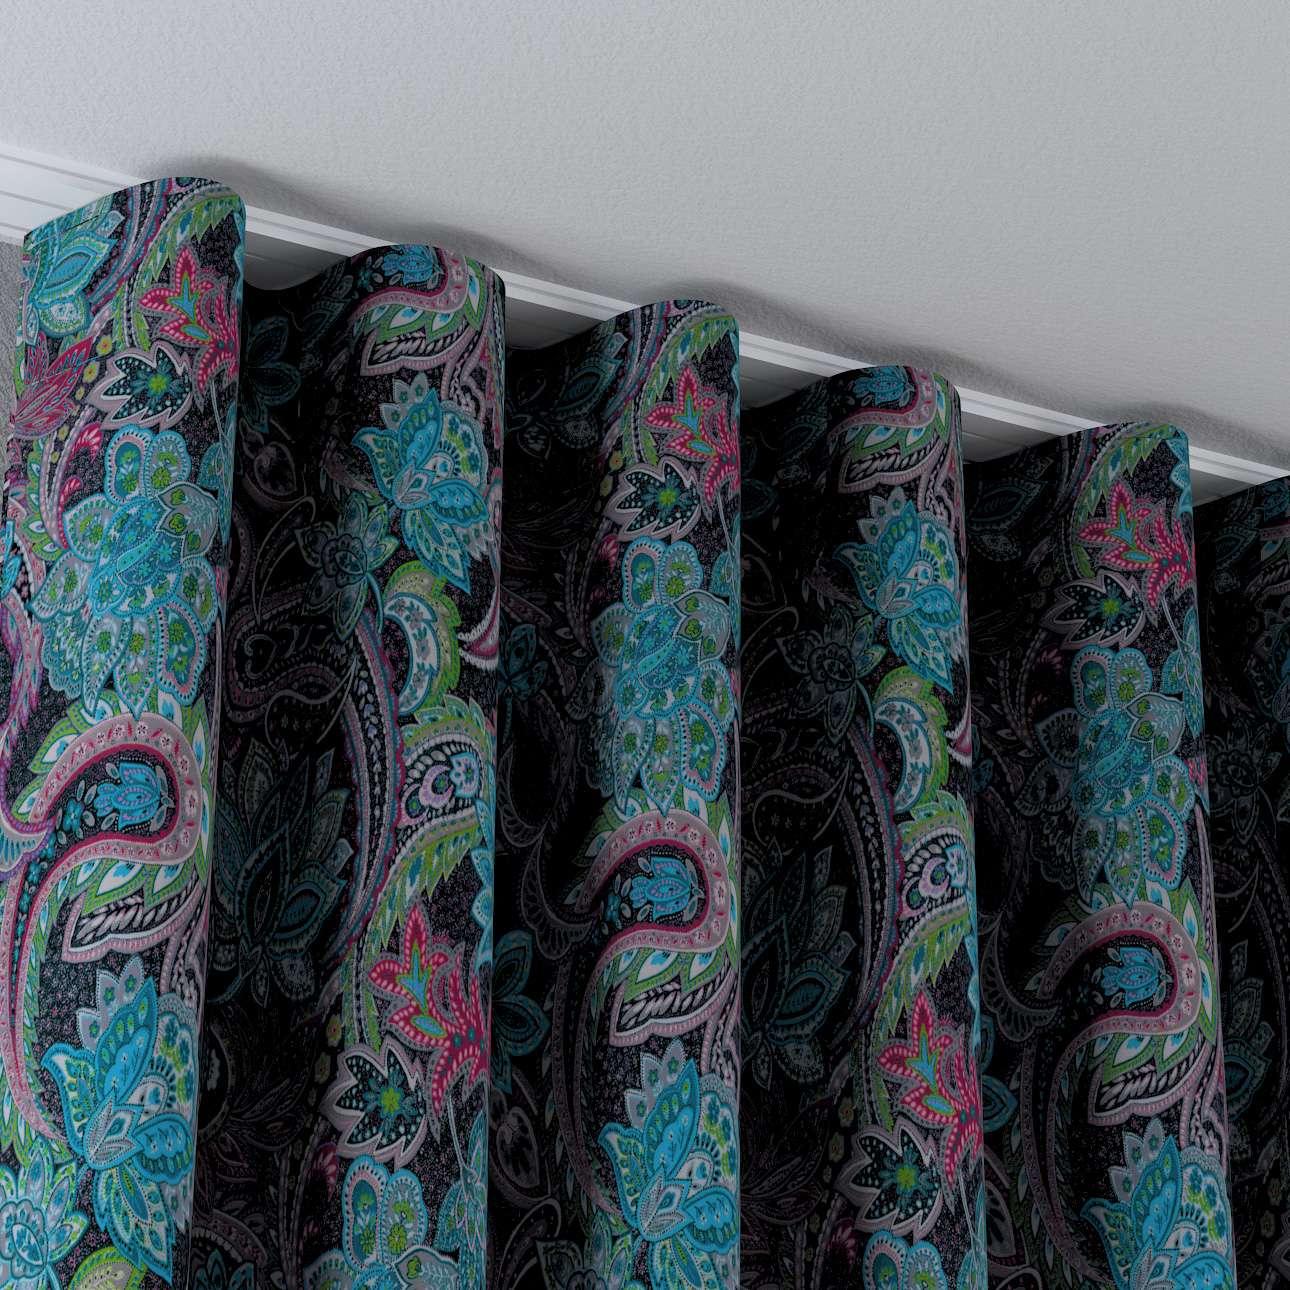 Zaves s riasením WAVE V kolekcii Velvet, tkanina: 704-22